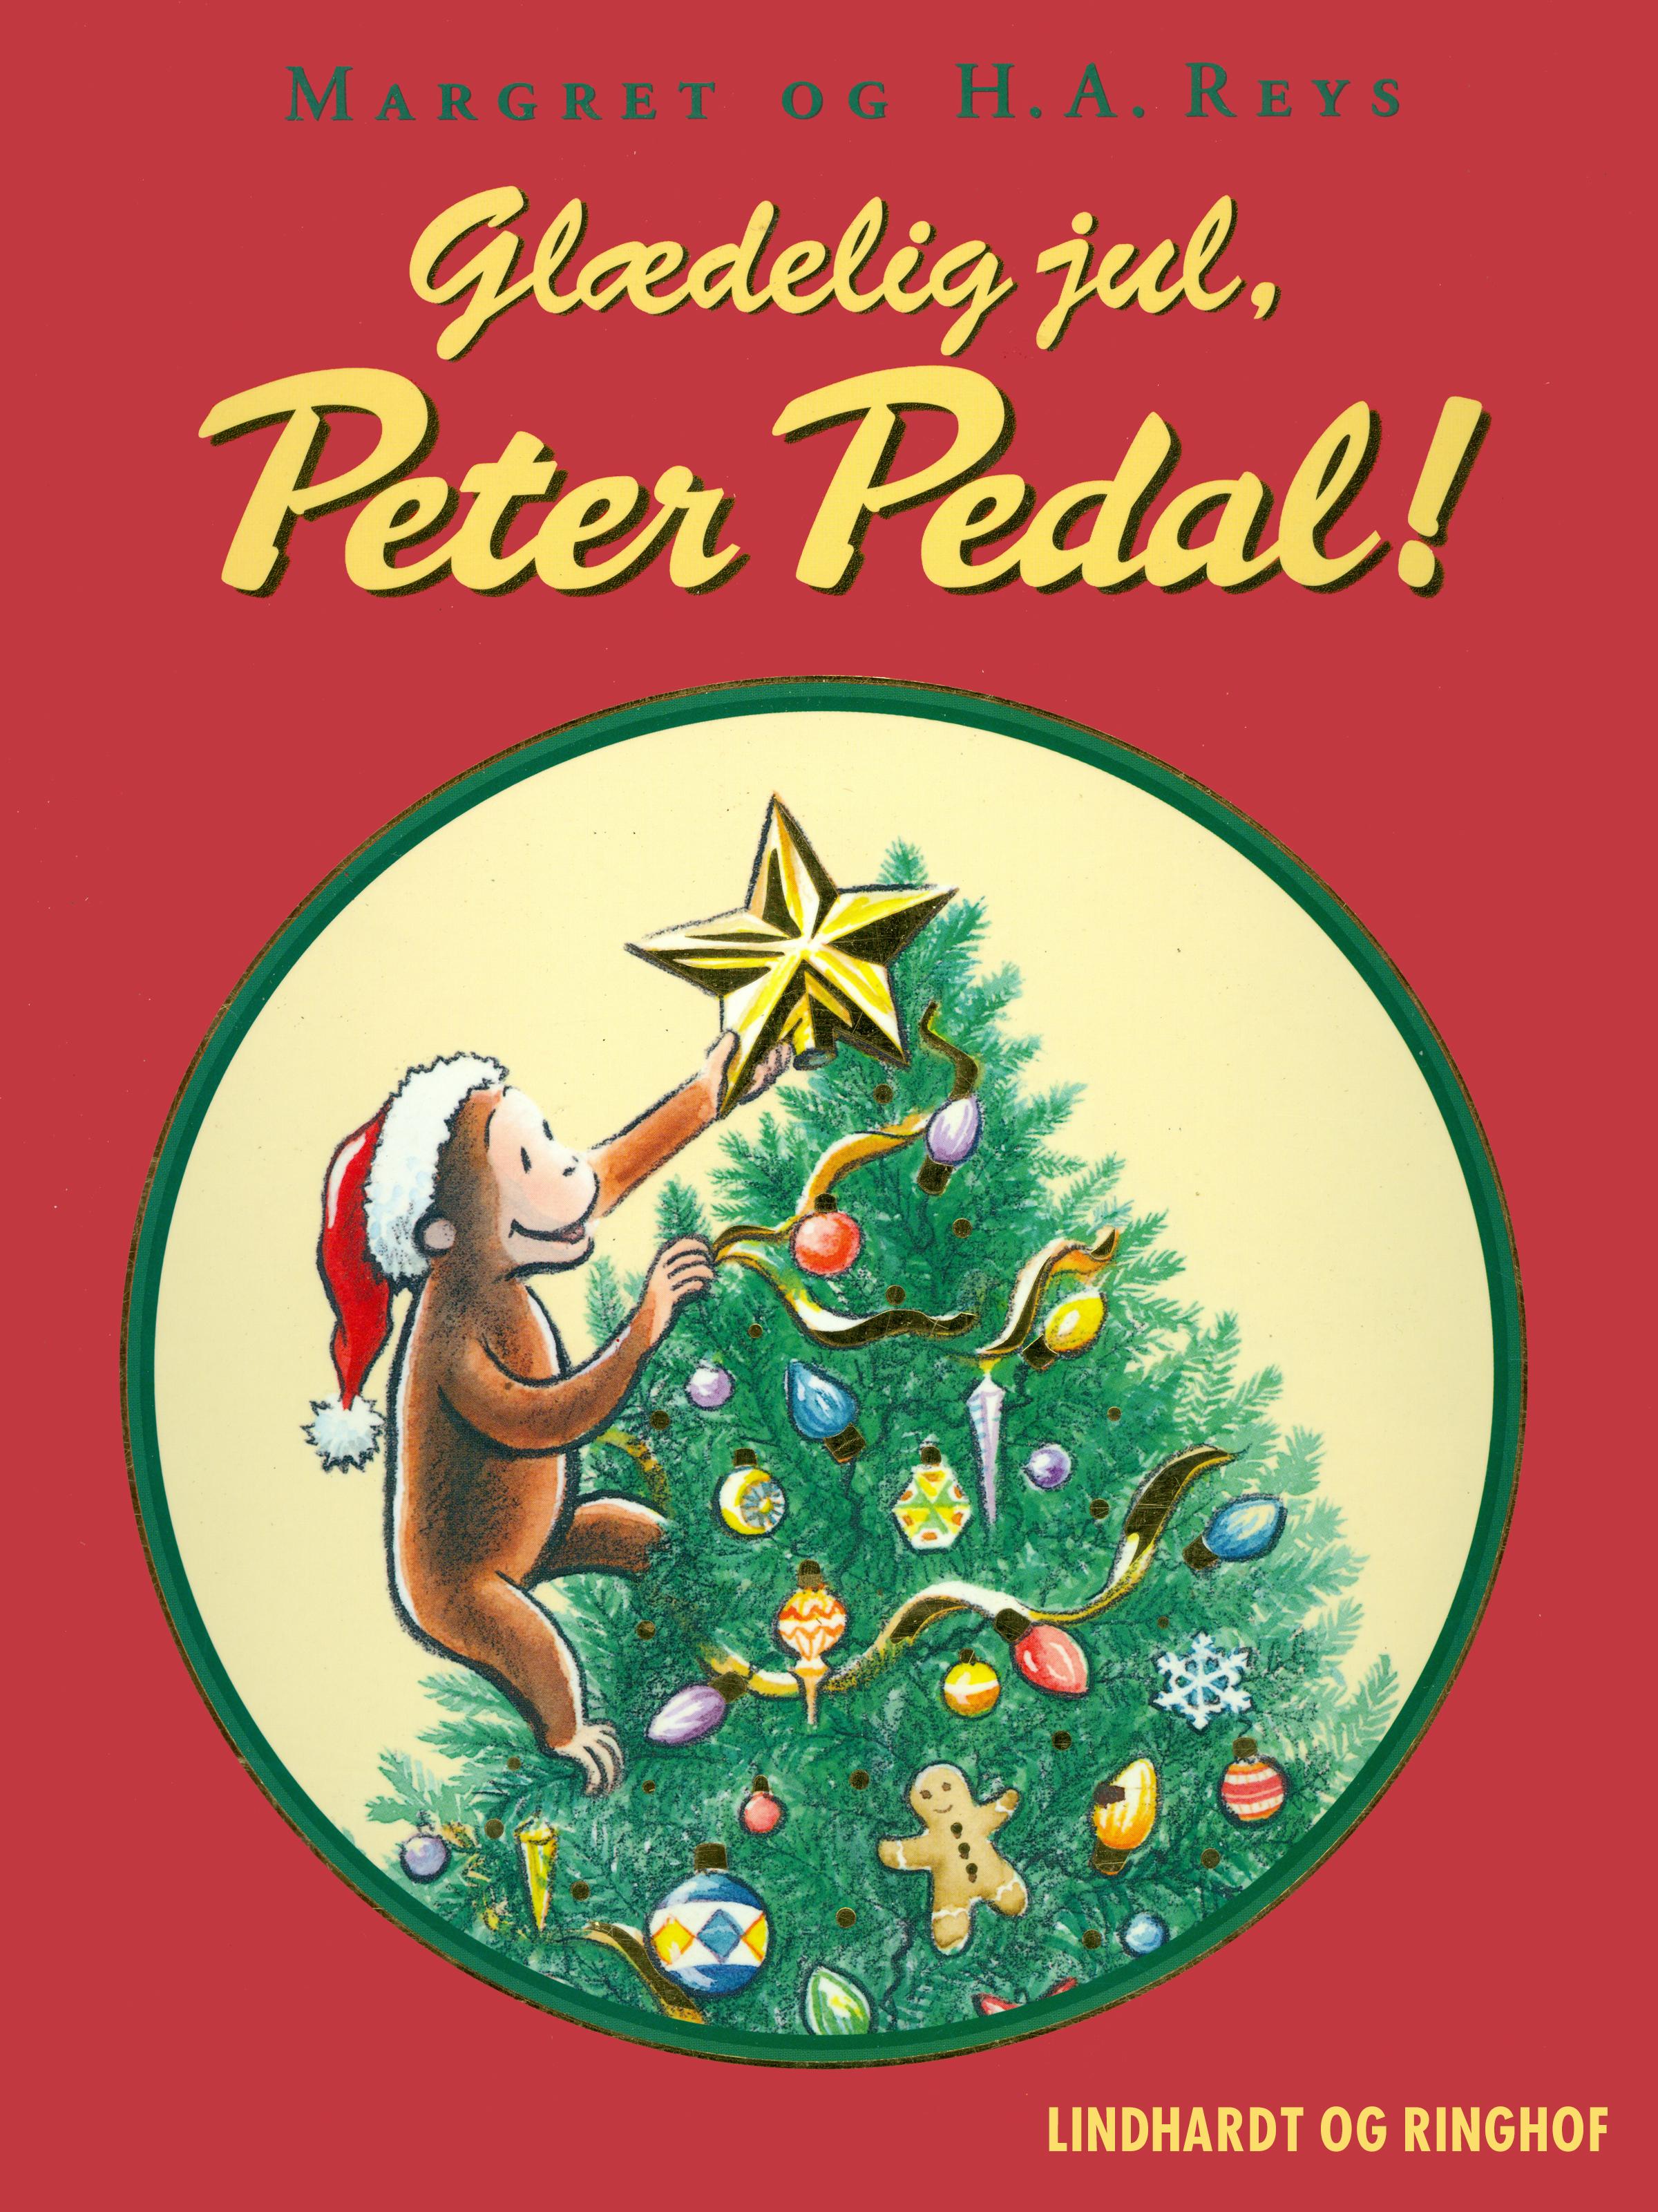 Glædelig jul, Peter Pedal - Maneno